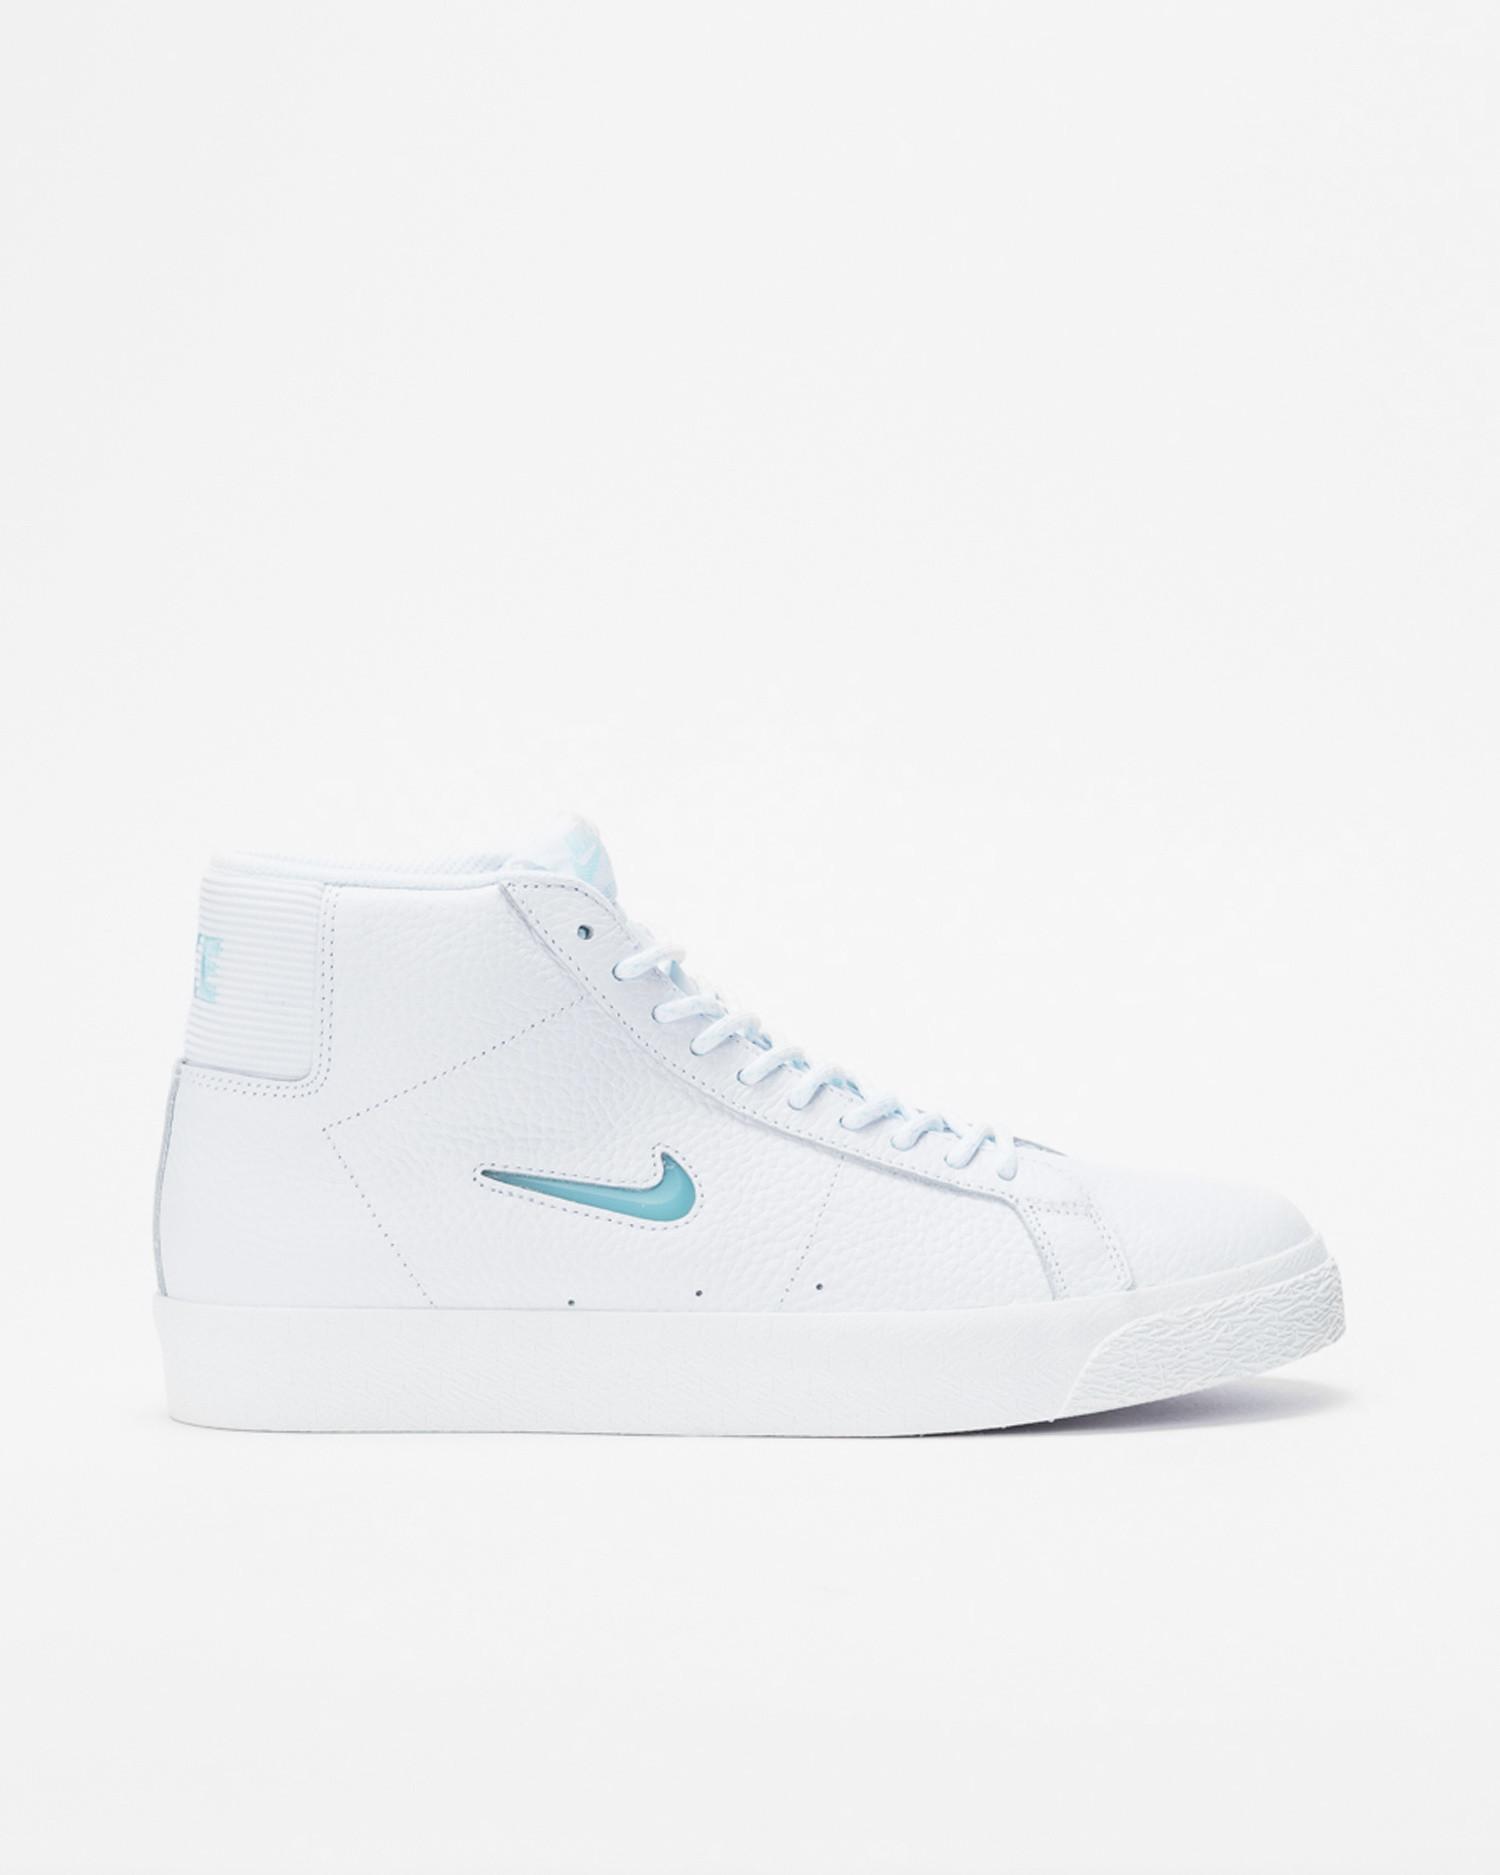 Nike SB Blazer Mid Premium WHITE/GLACIER ICE-WHITE-SUMMIT WHITE